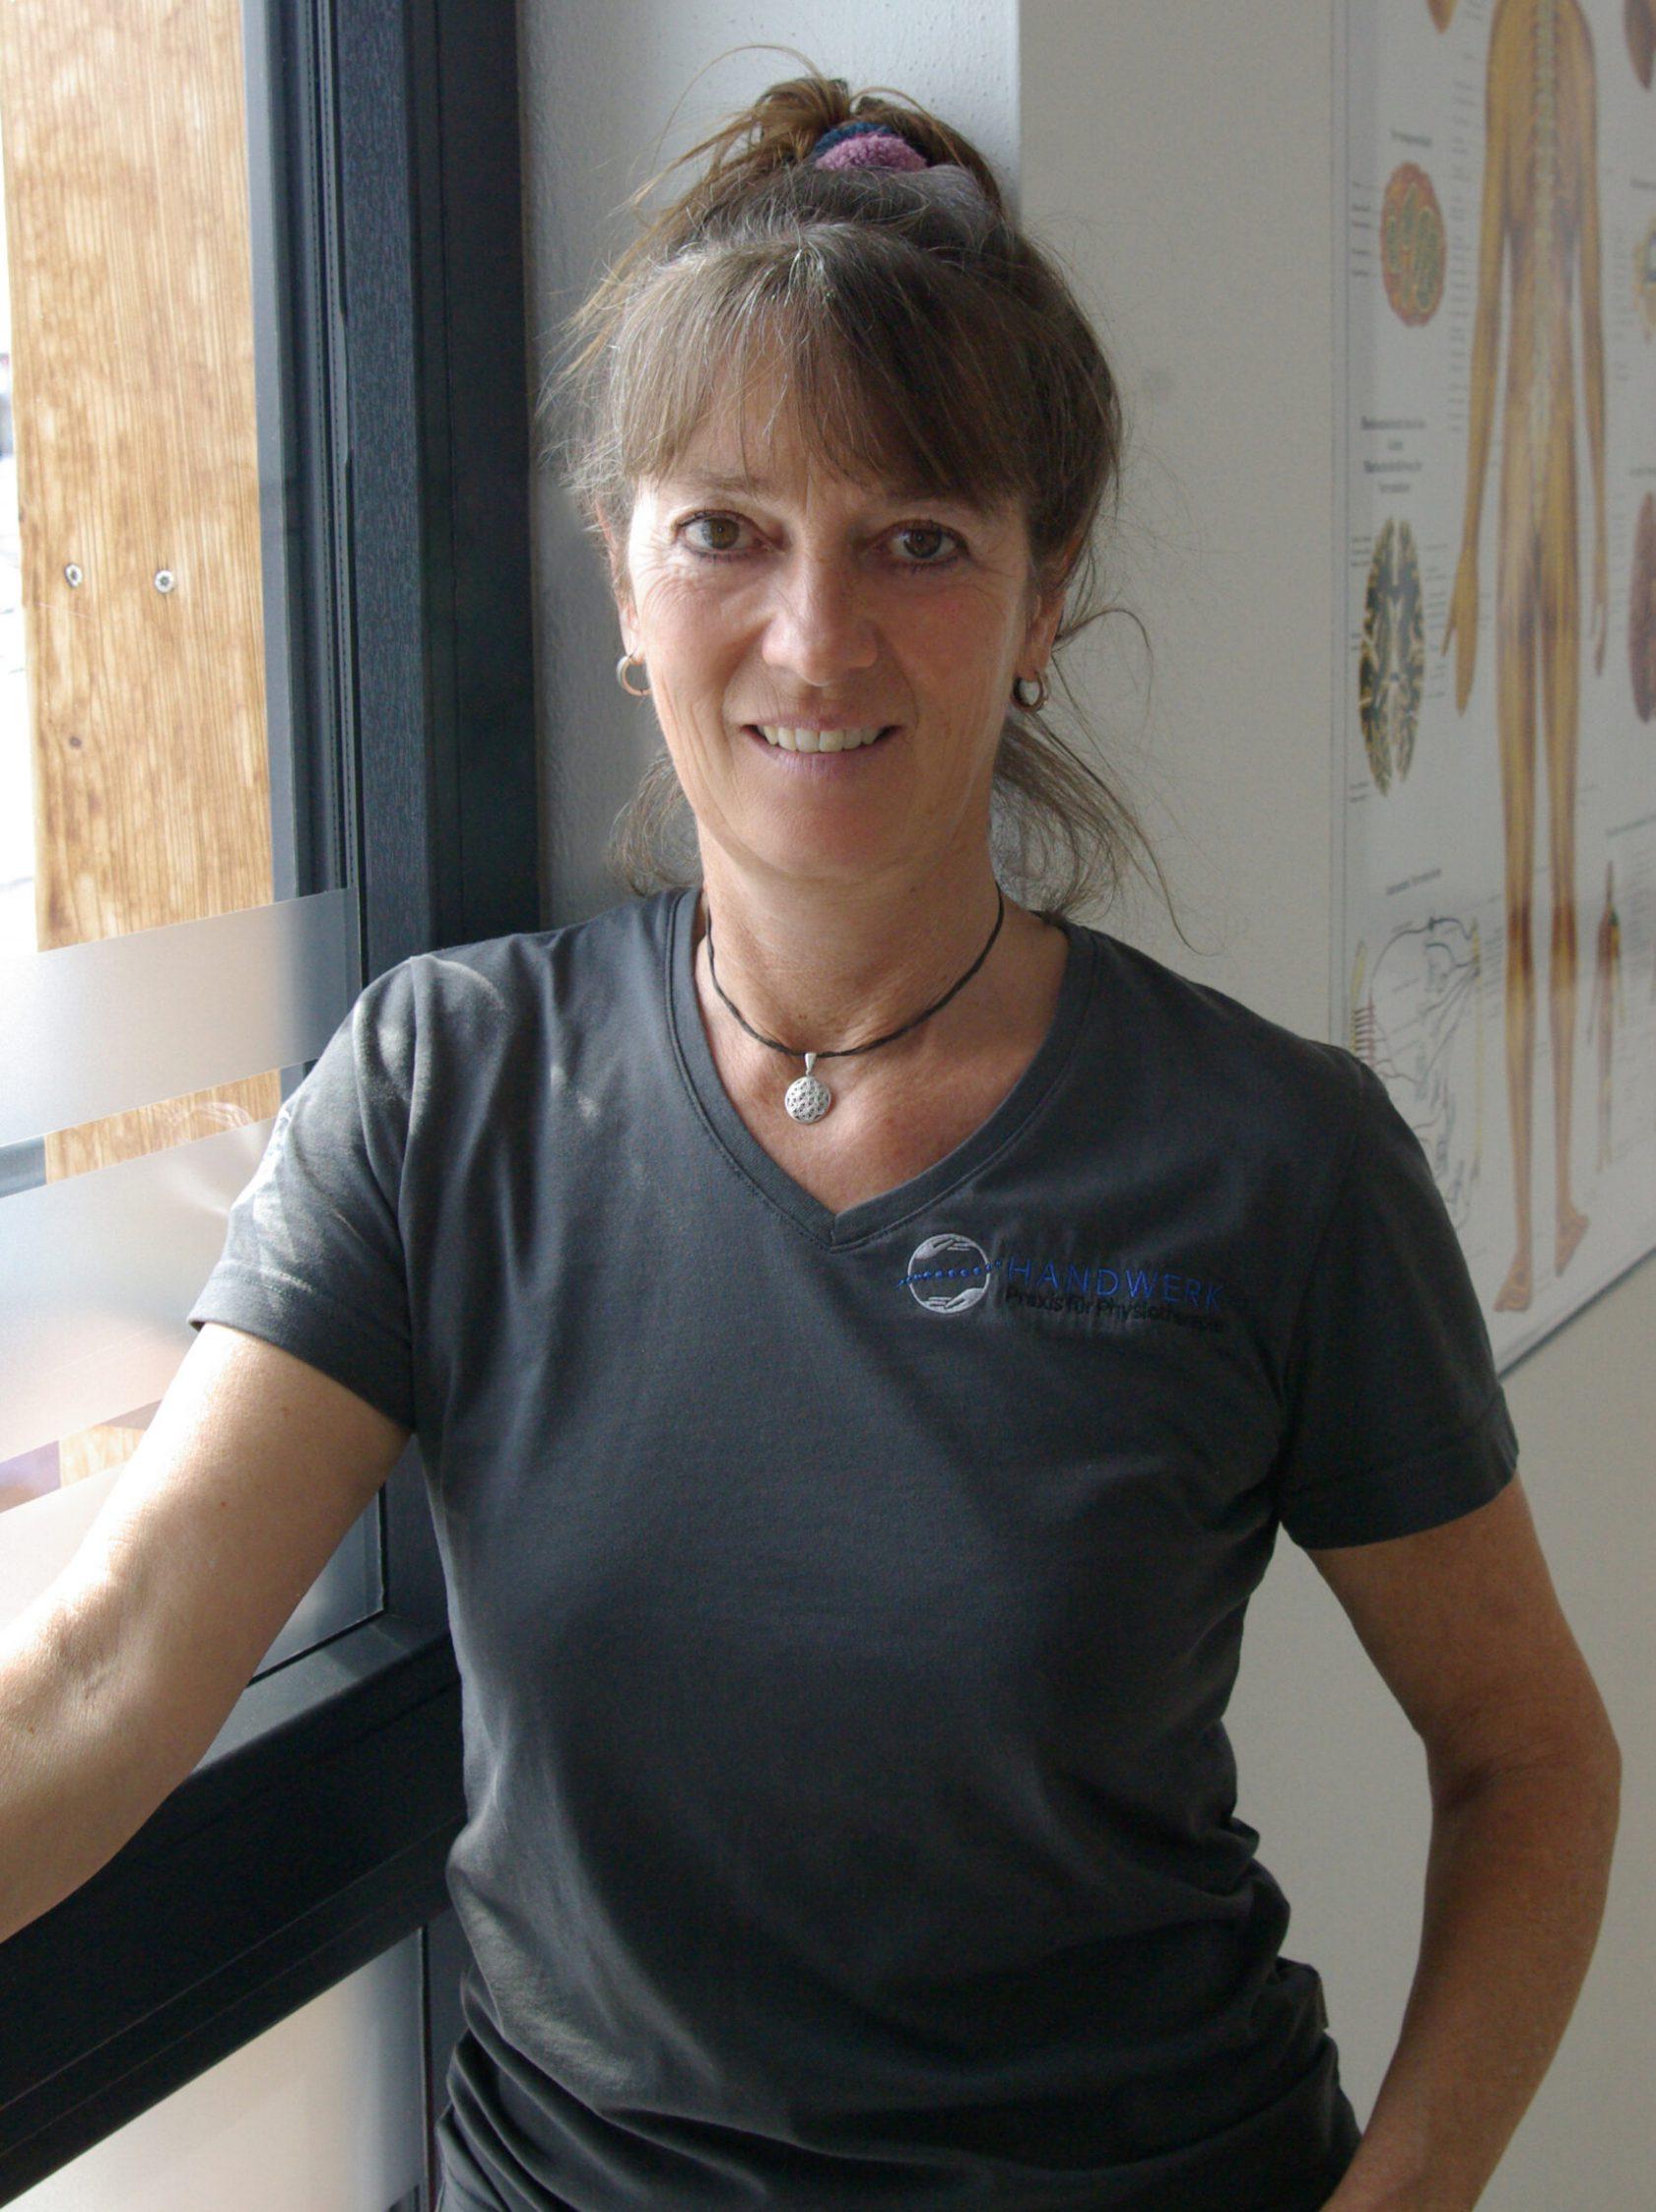 Claudia Wulferding